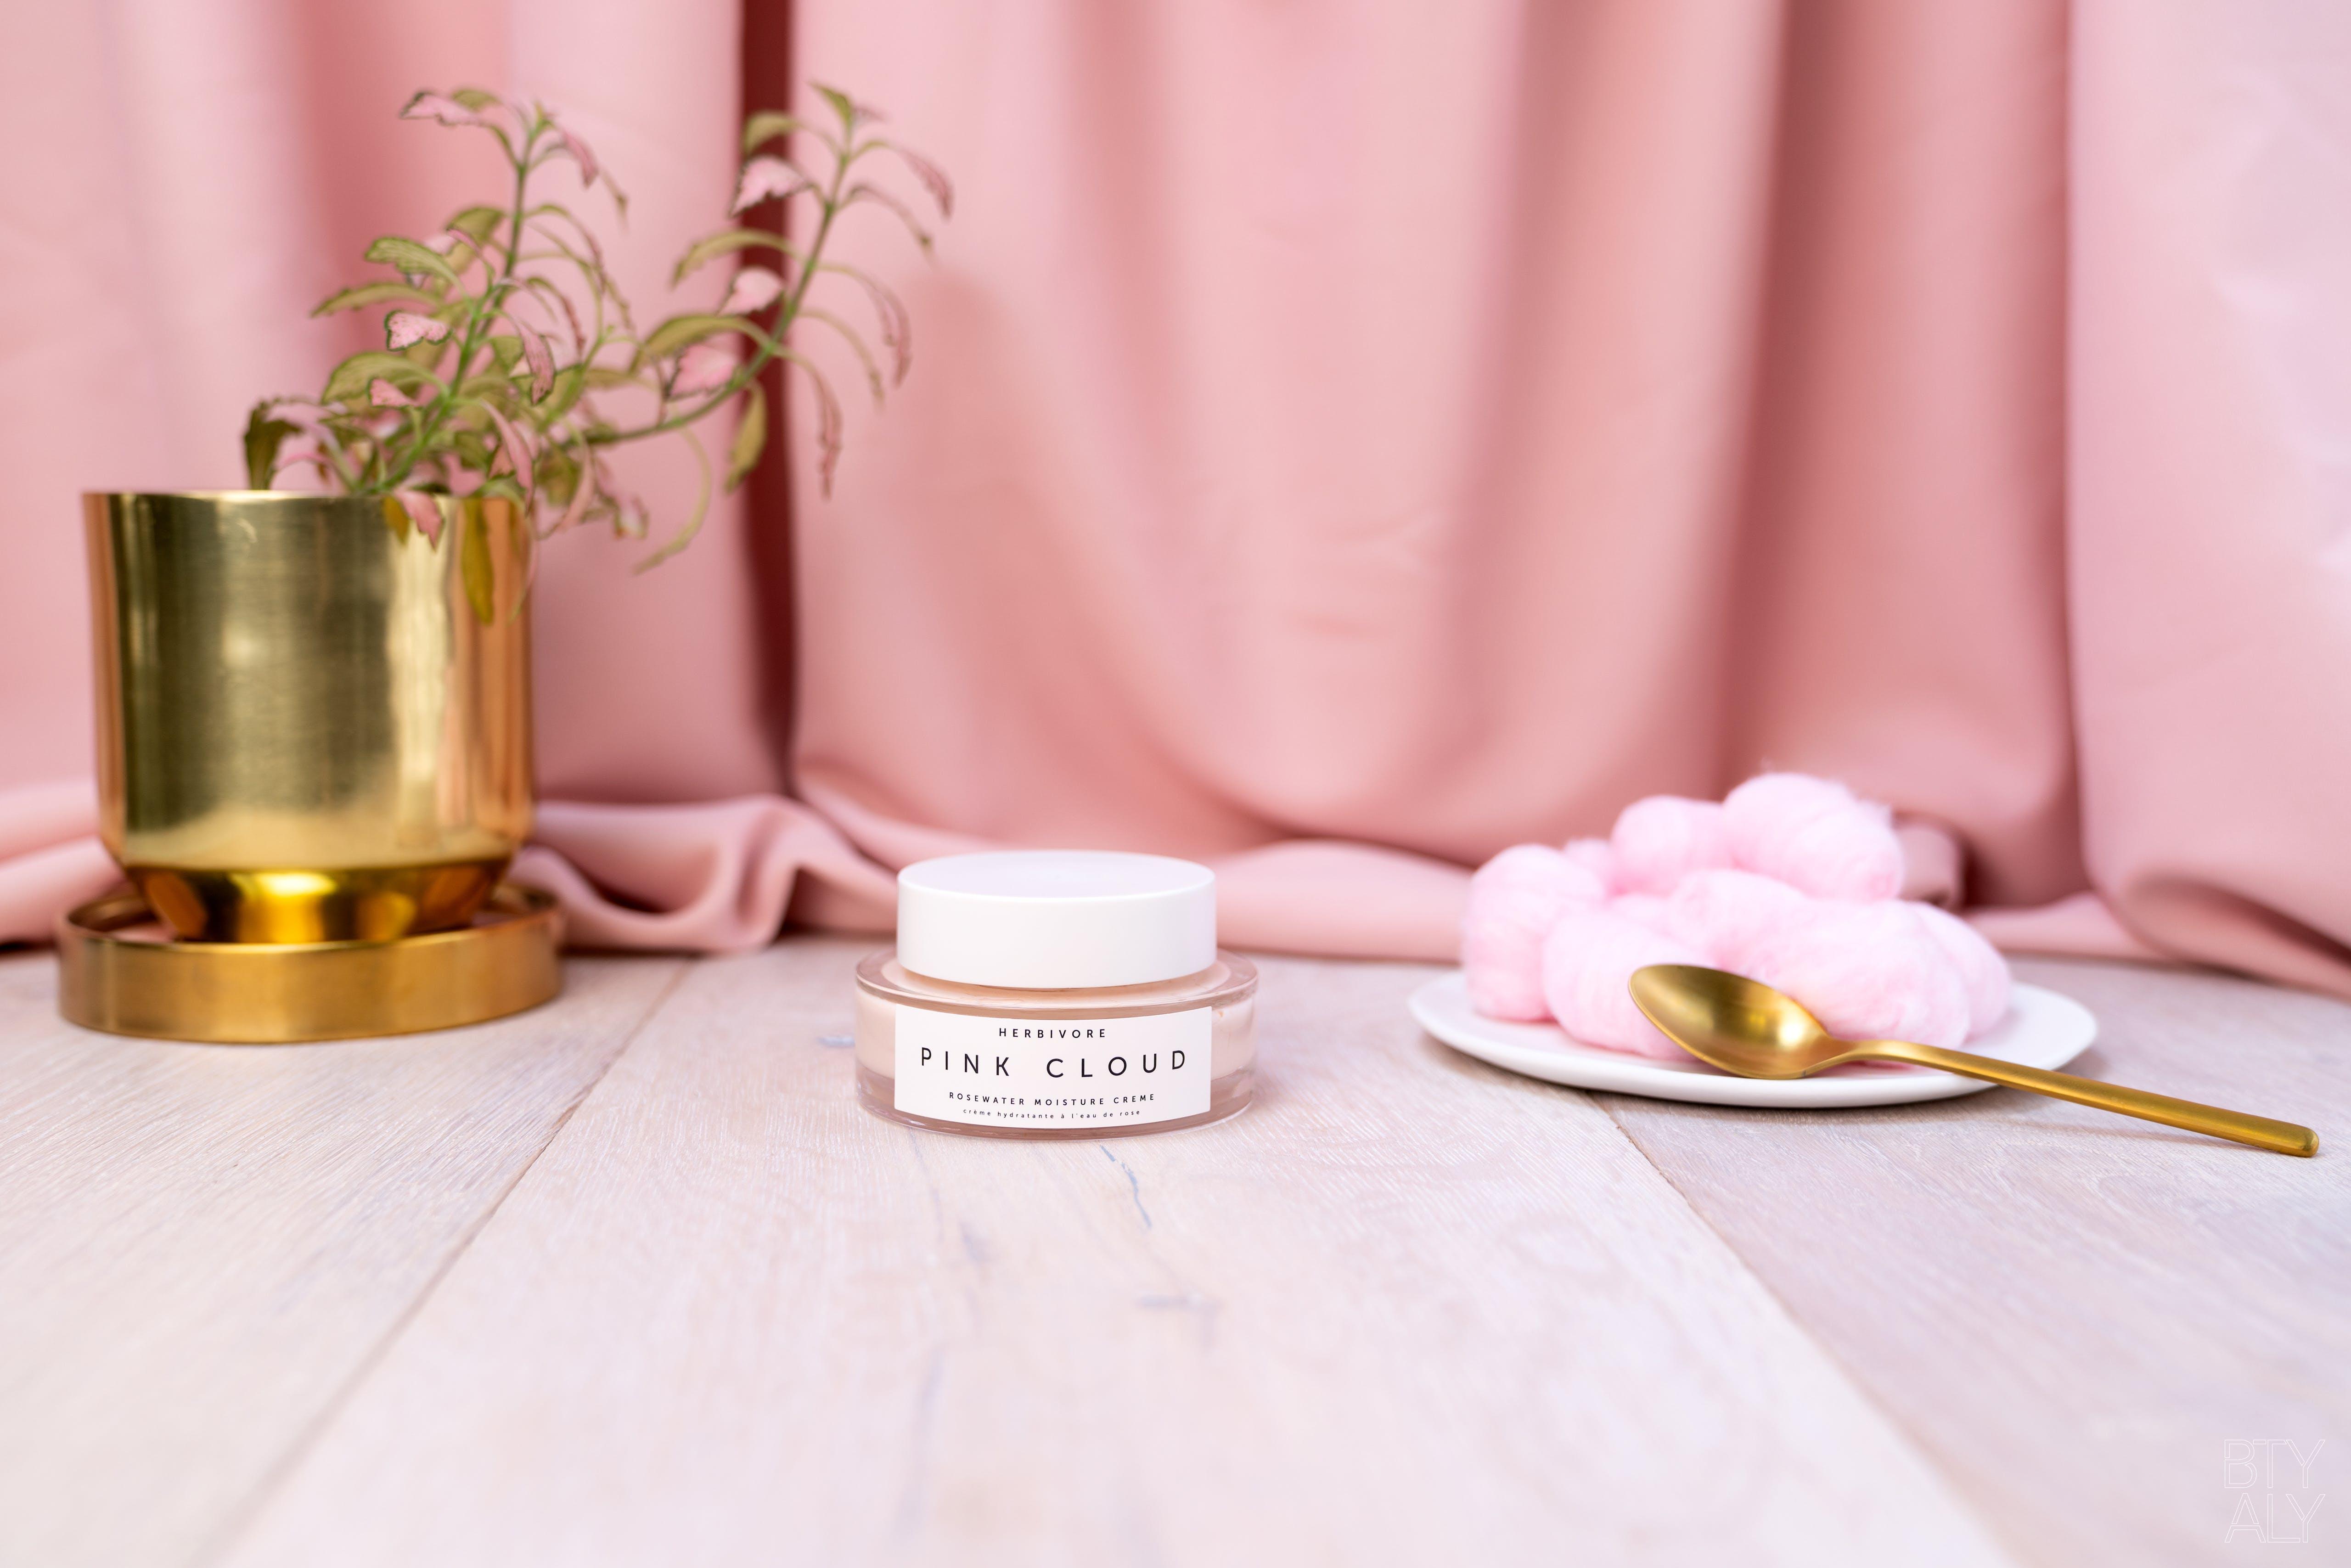 Herbivore Pink Cloud Rosewater Moisture Cream Title